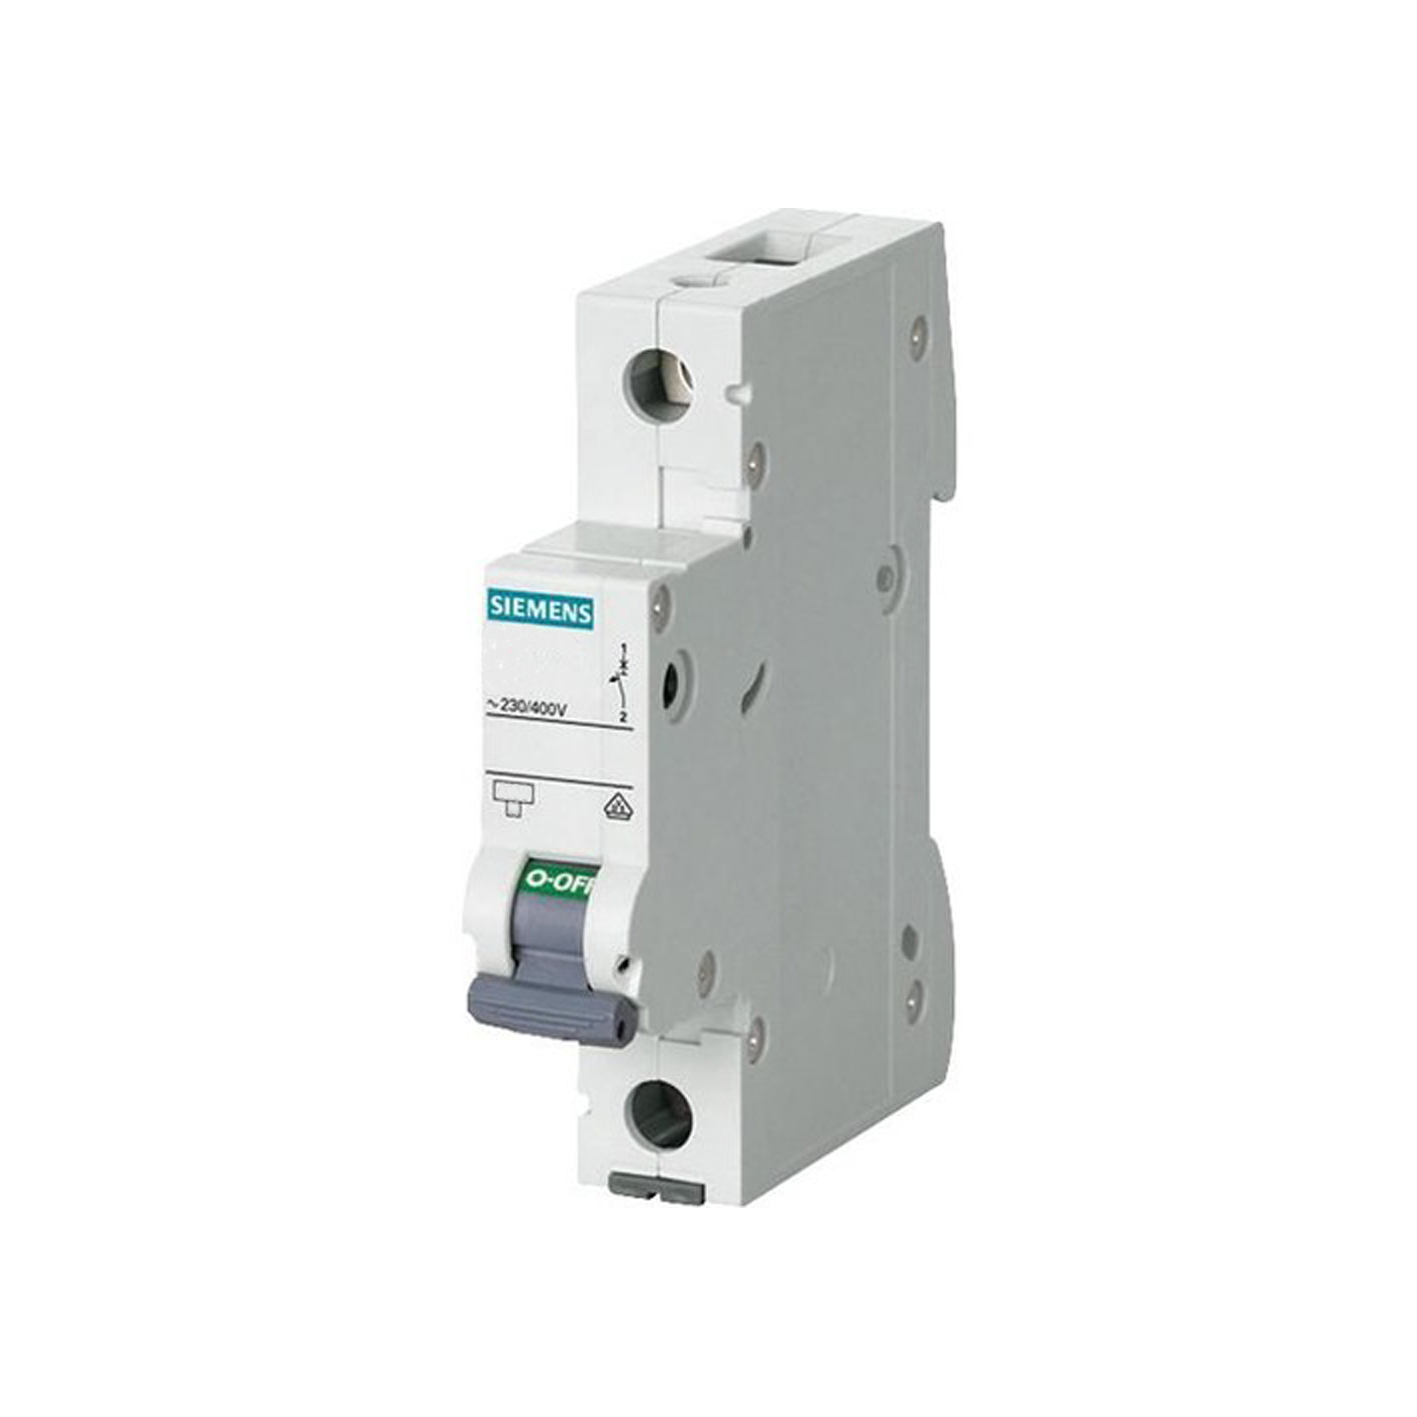 Siemens 1x25A Otomatik Sigorta